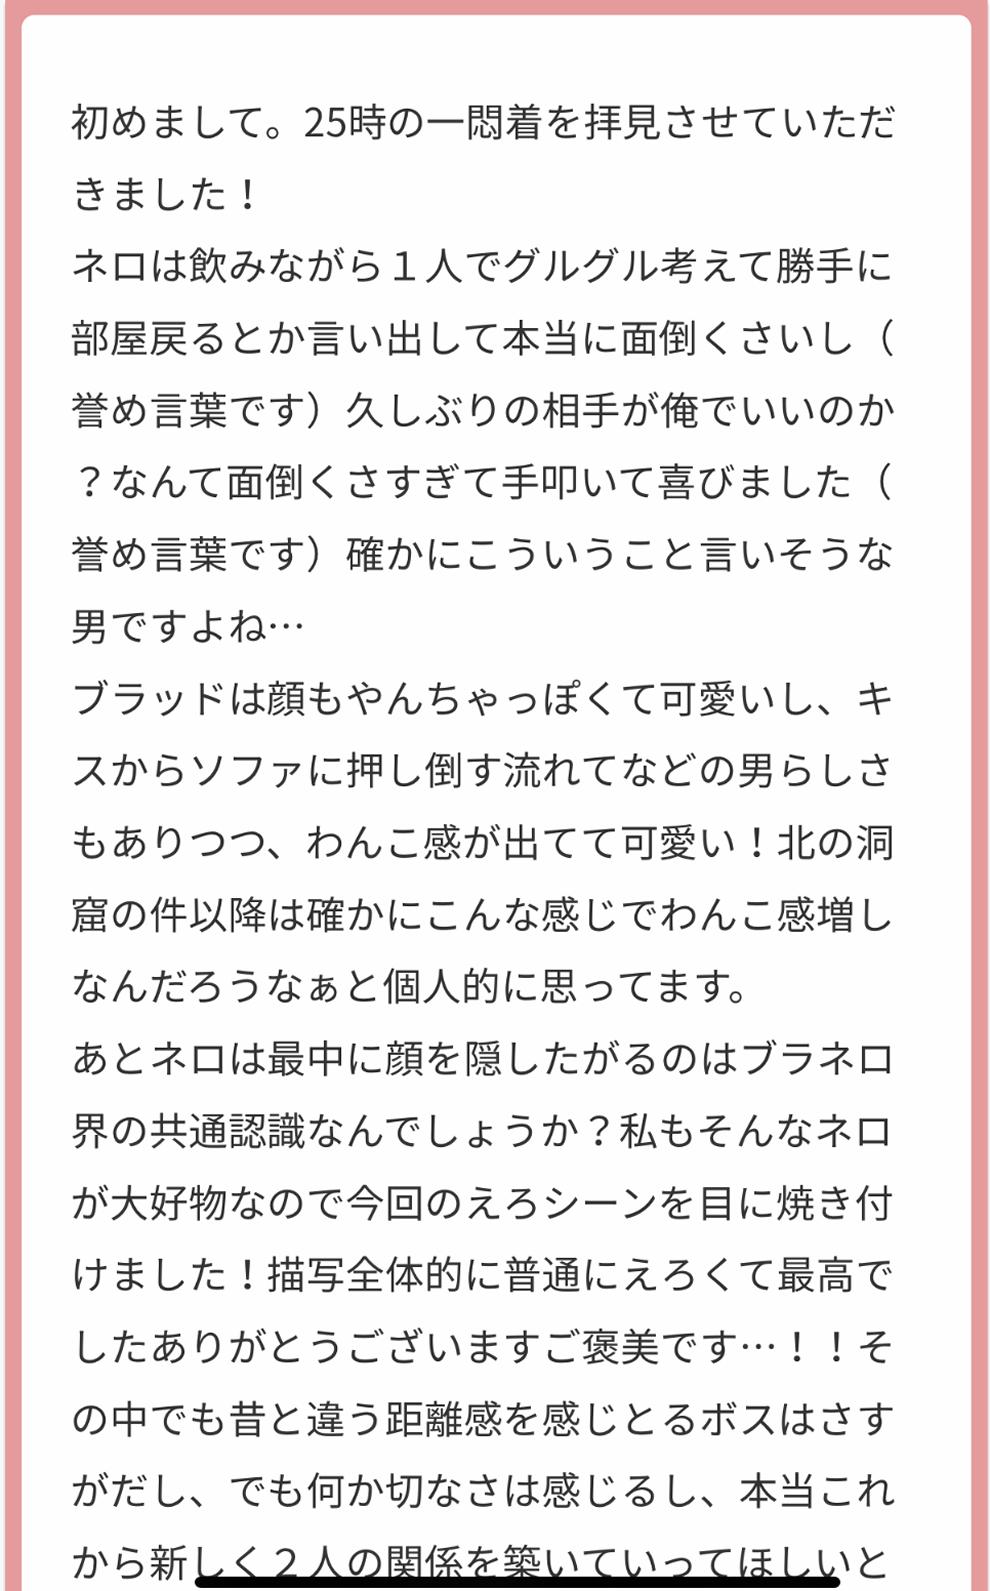 25時の一悶着:感想返信②(〜6/19)|芯|note